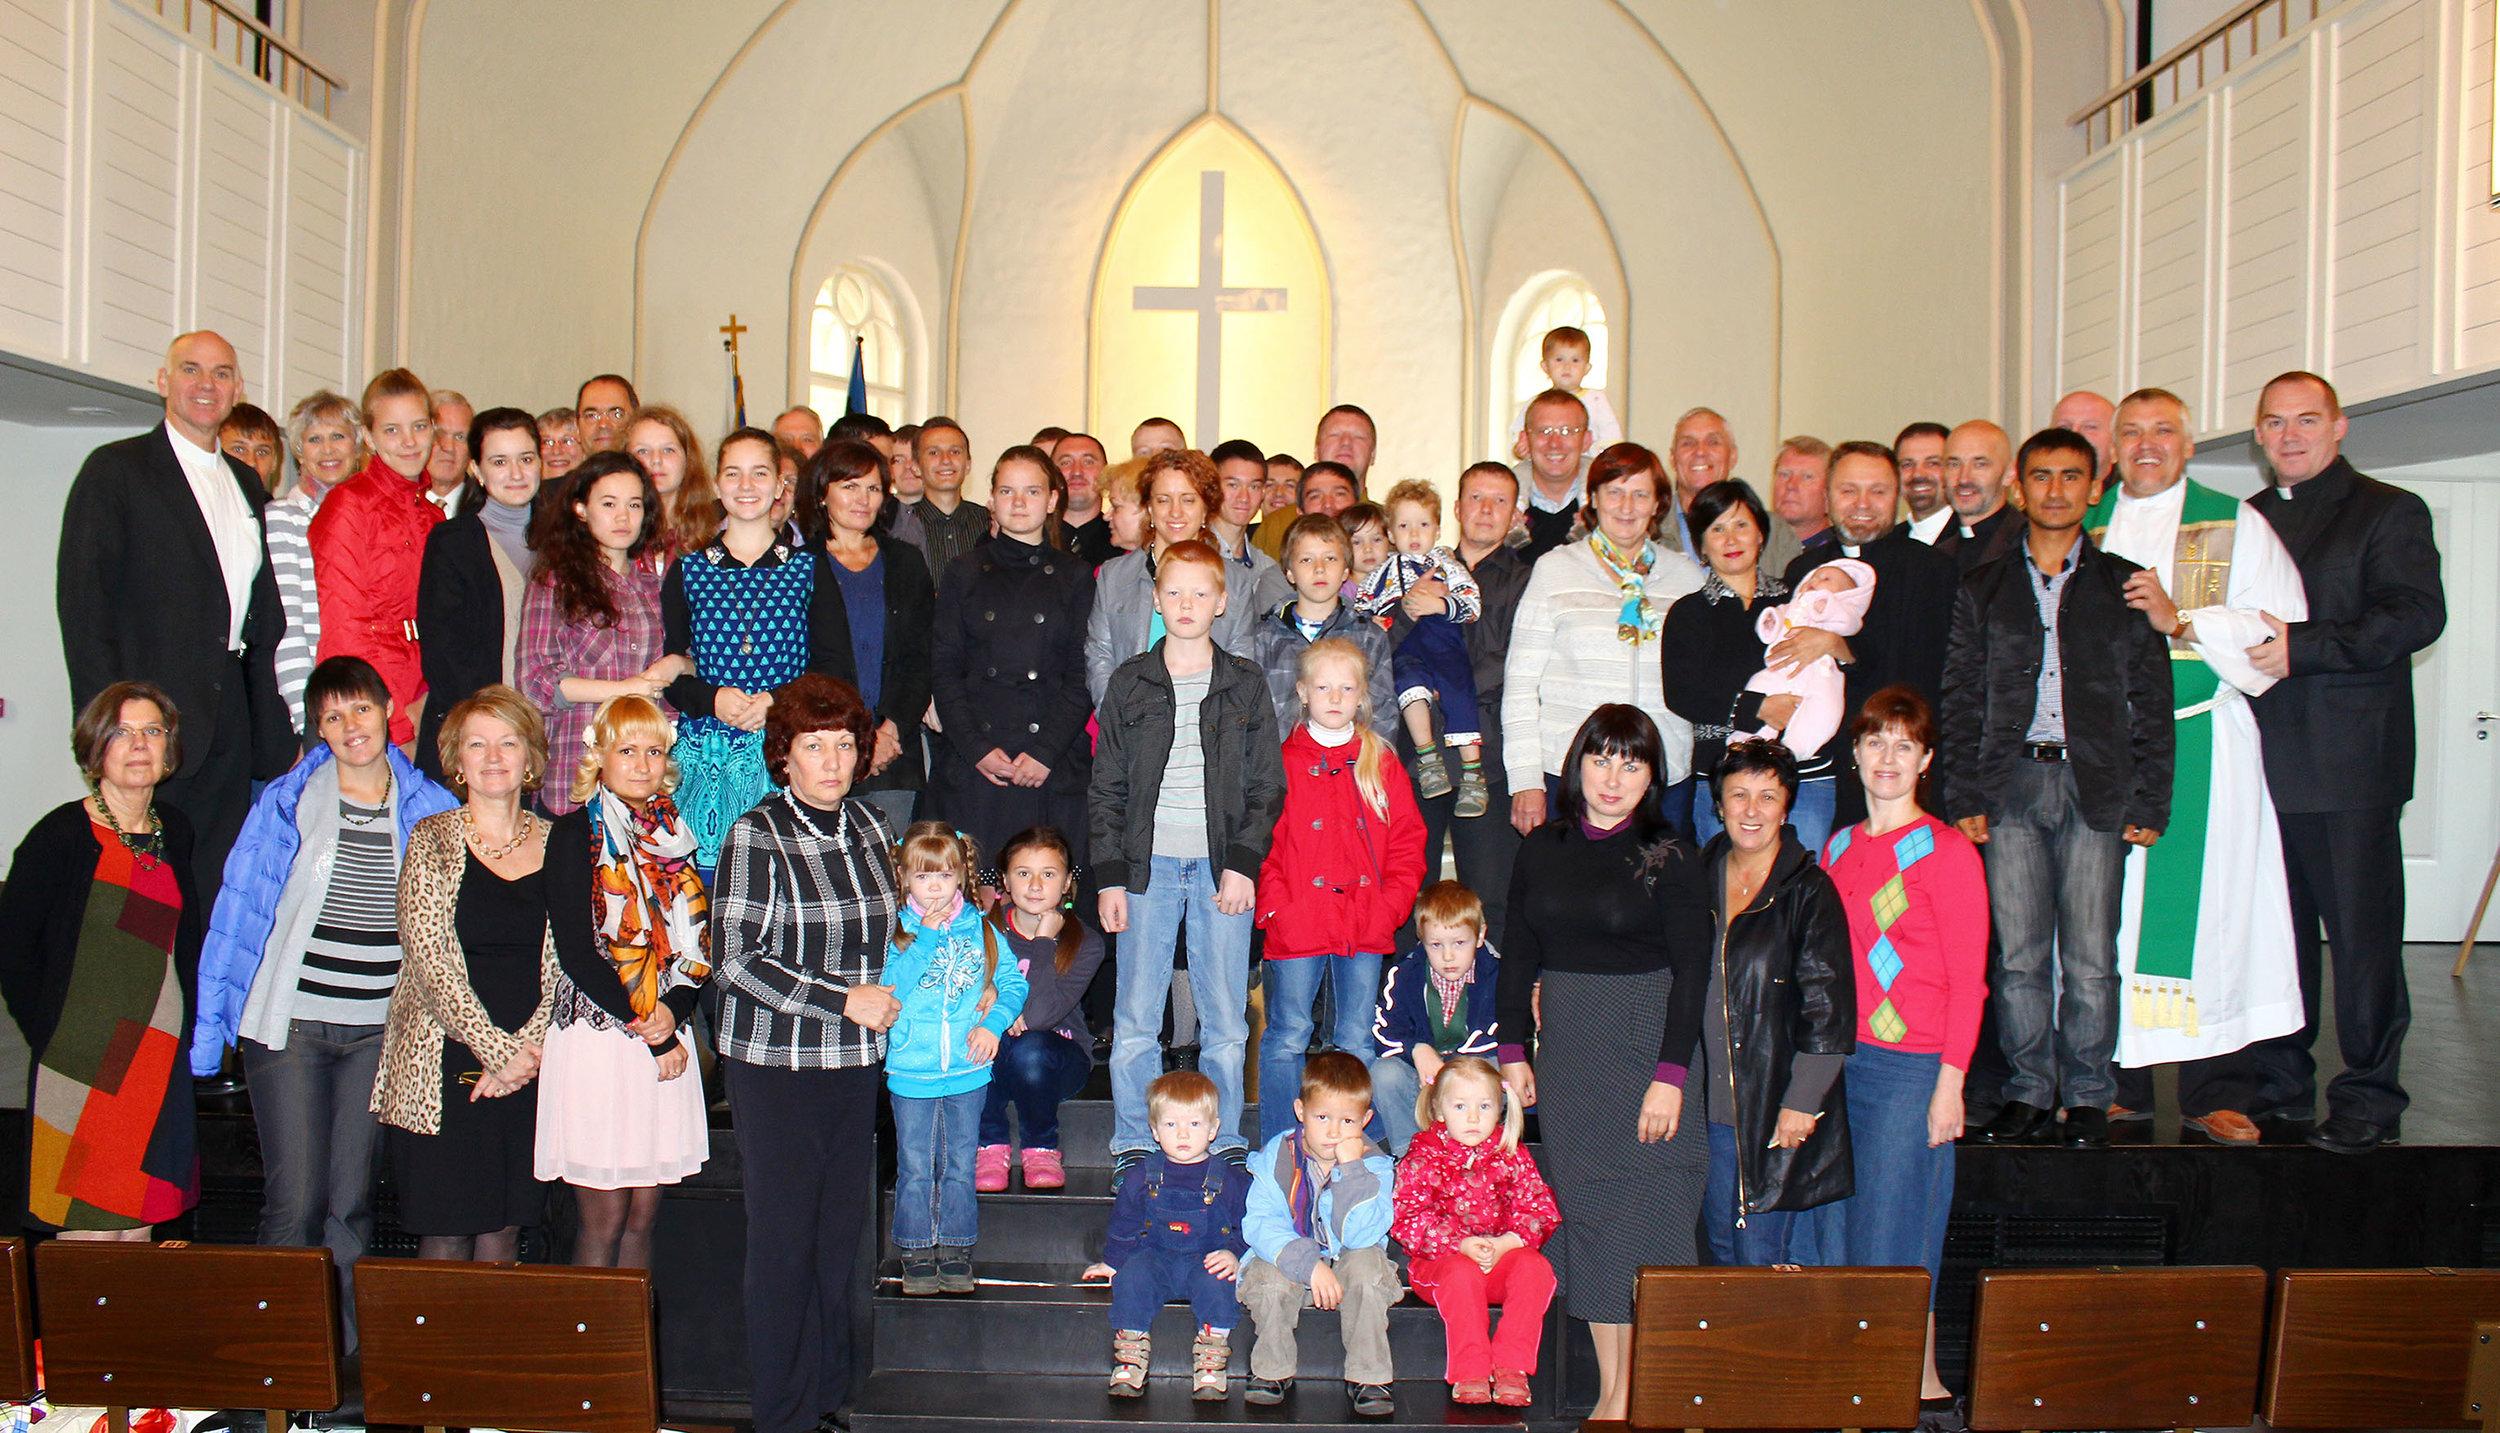 Reformed Presbyterian Church of St. Petersburg